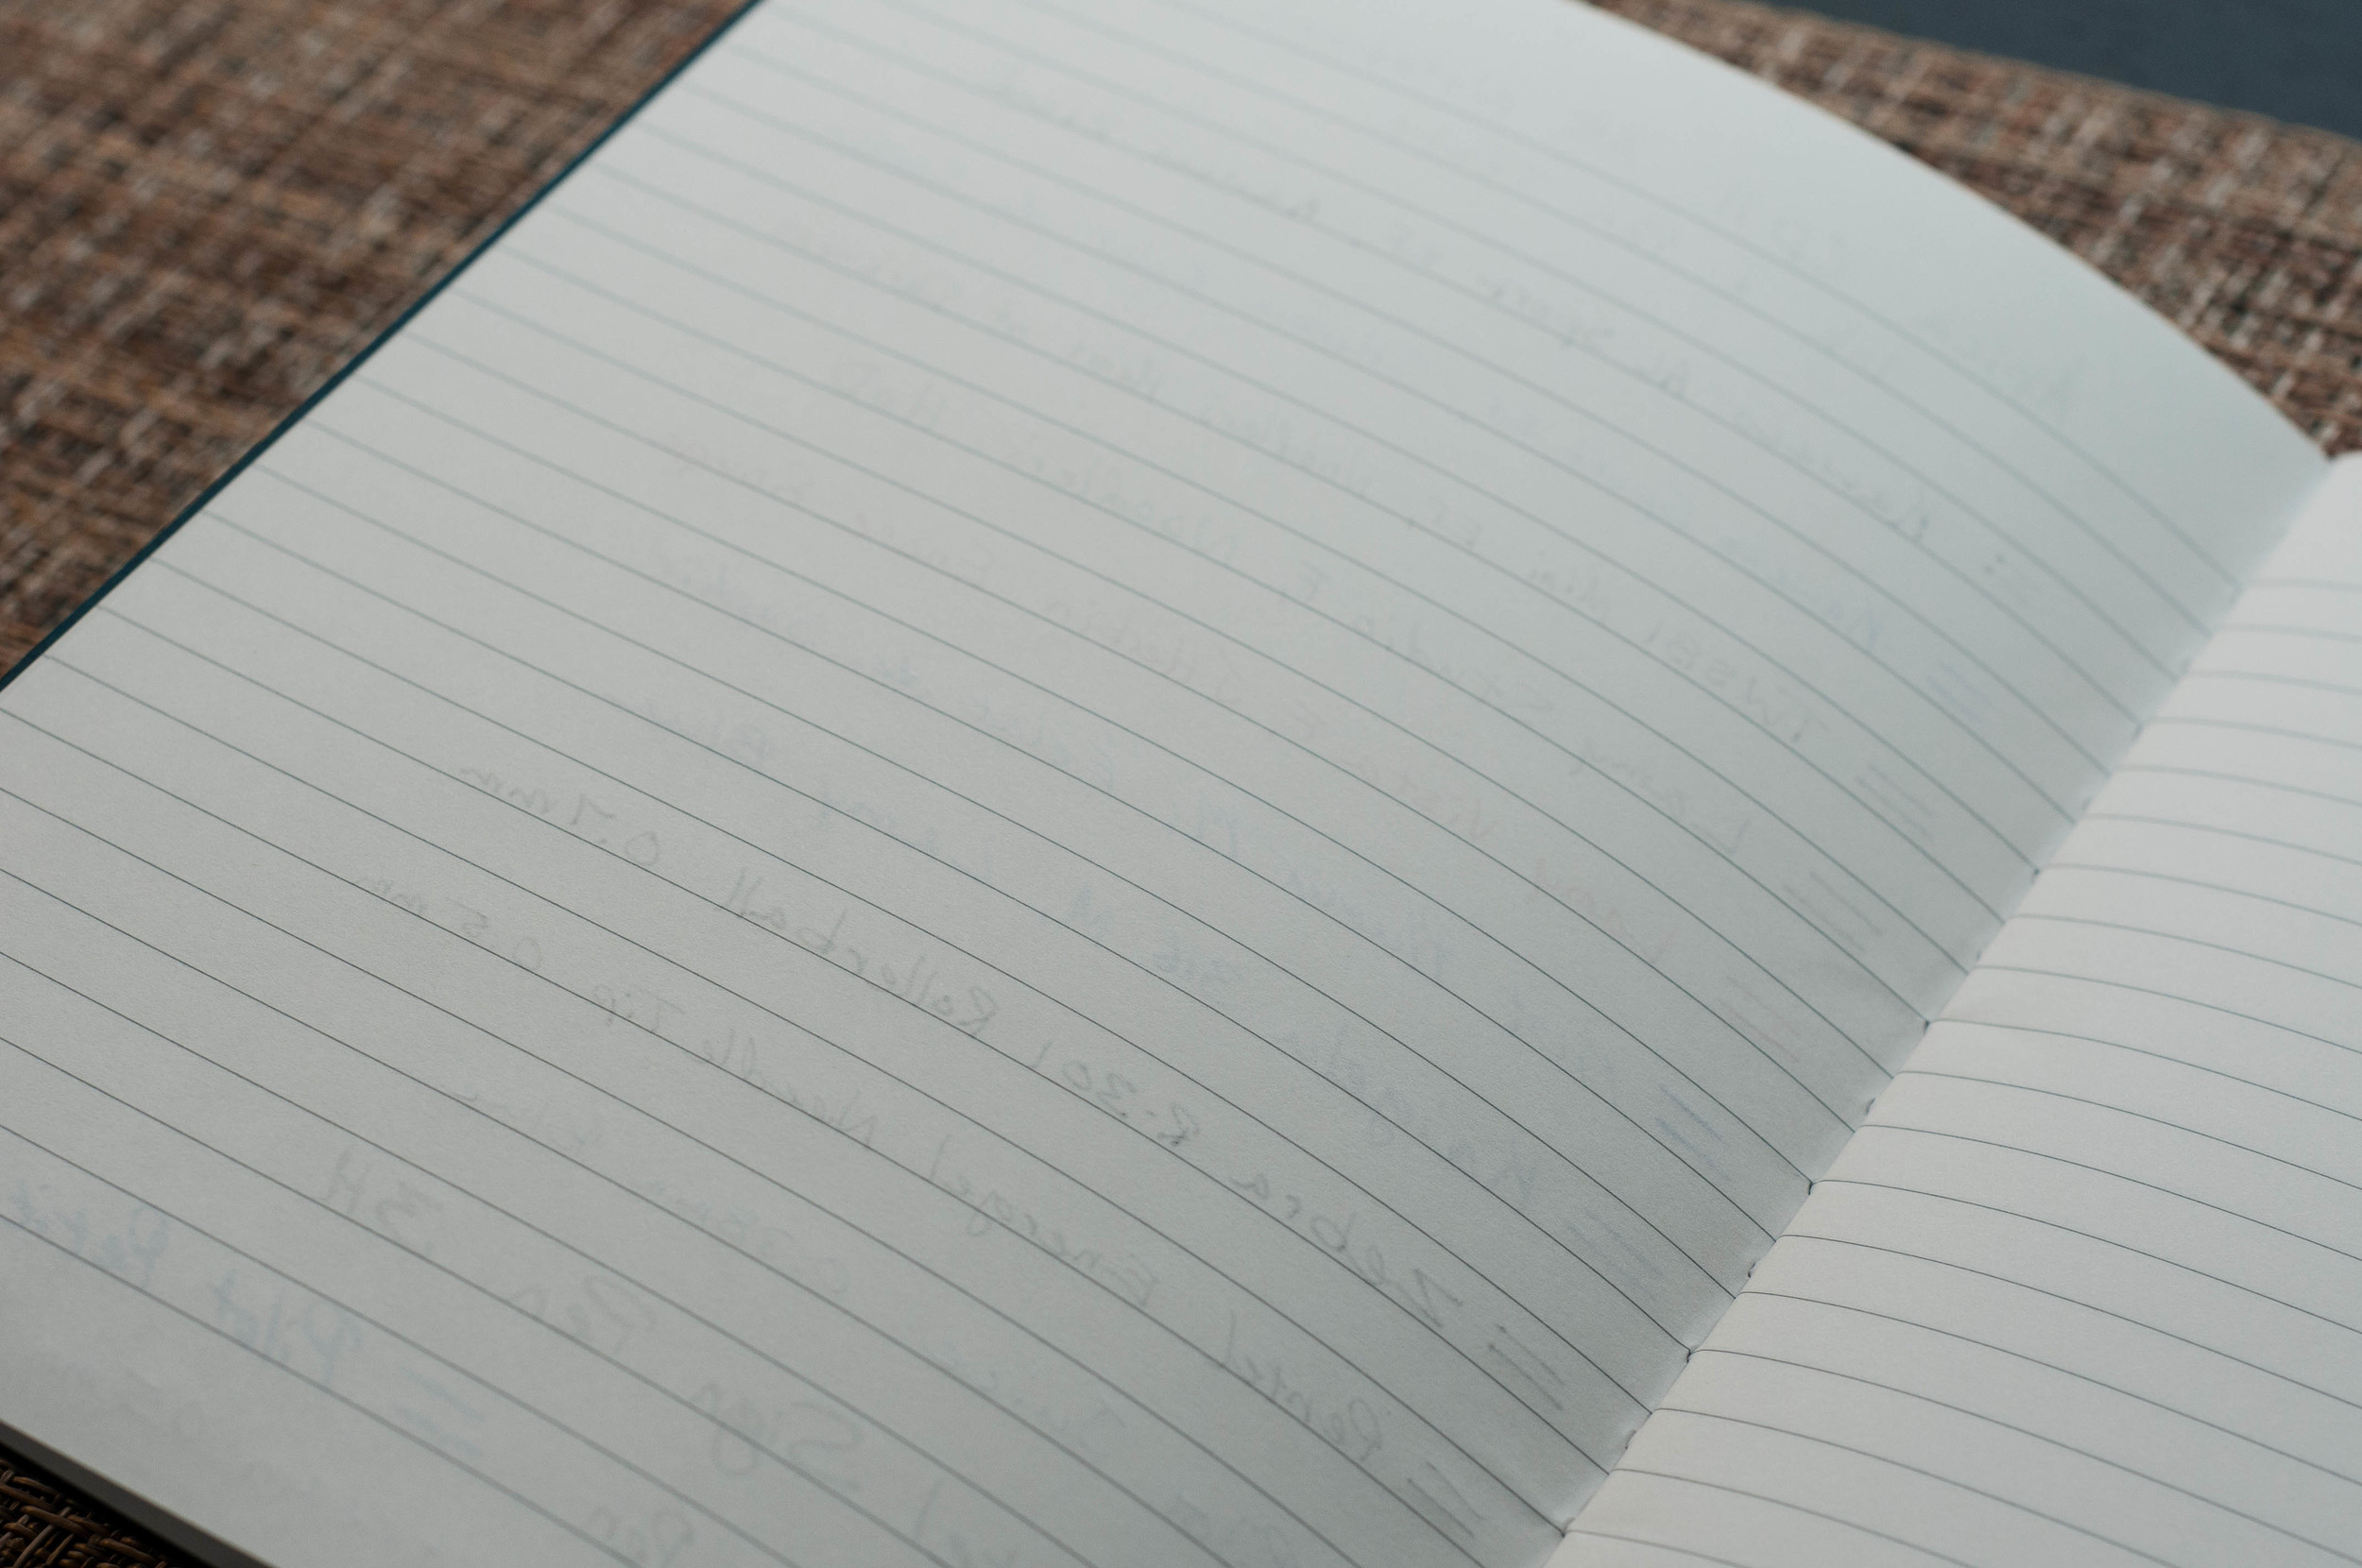 Apica CD Notebook Back.jpg